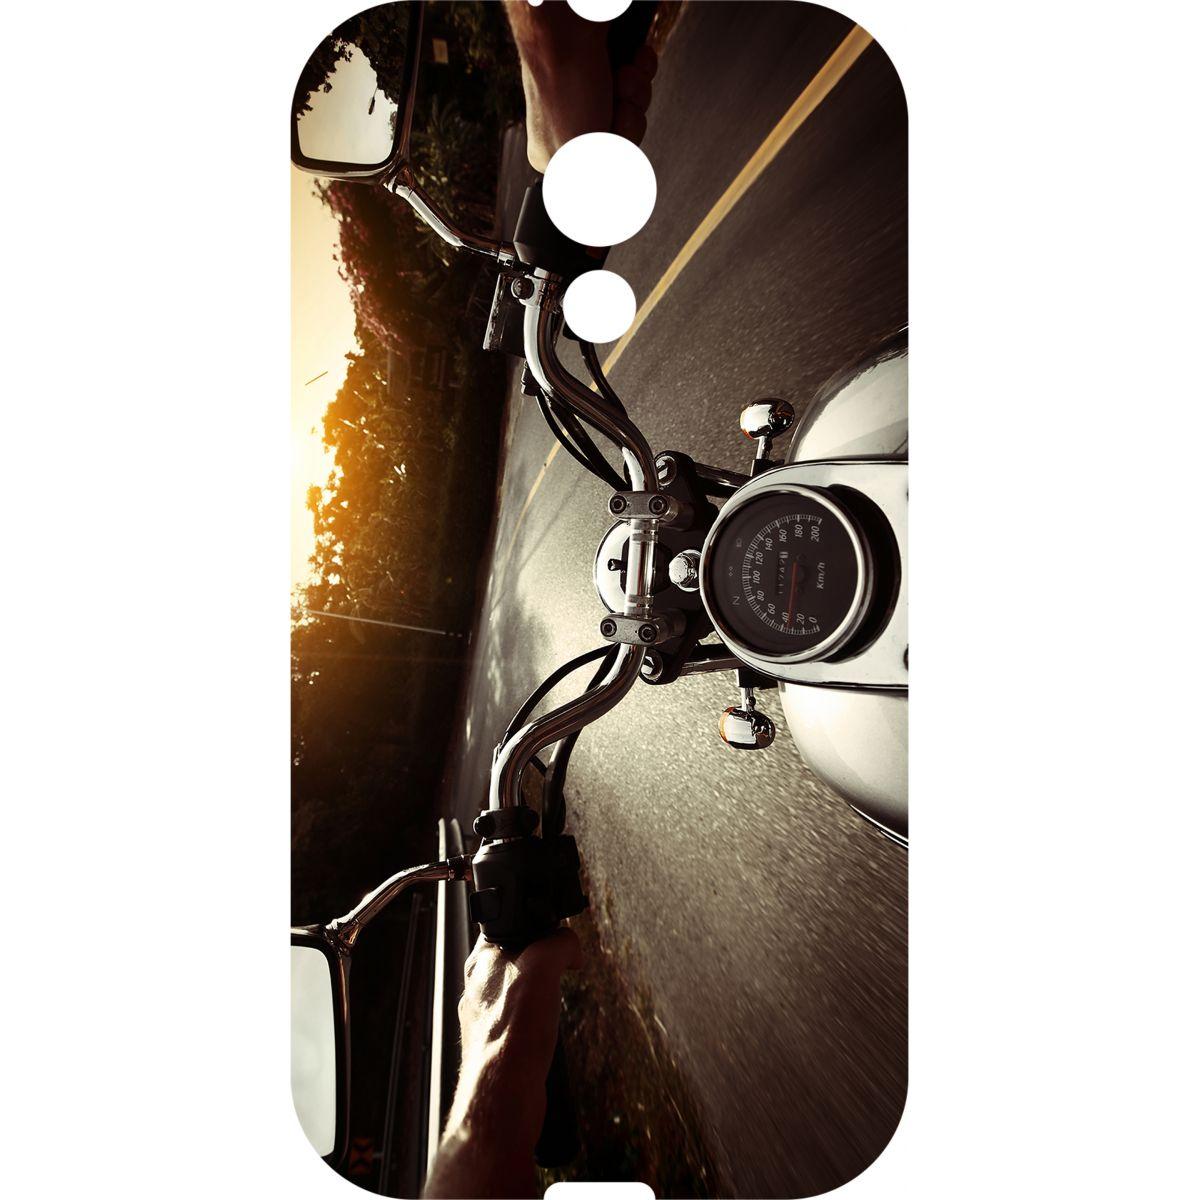 Capa Personalizada Exclusiva Motorola Moto G2 Xt1069 Xt1068 - CR11